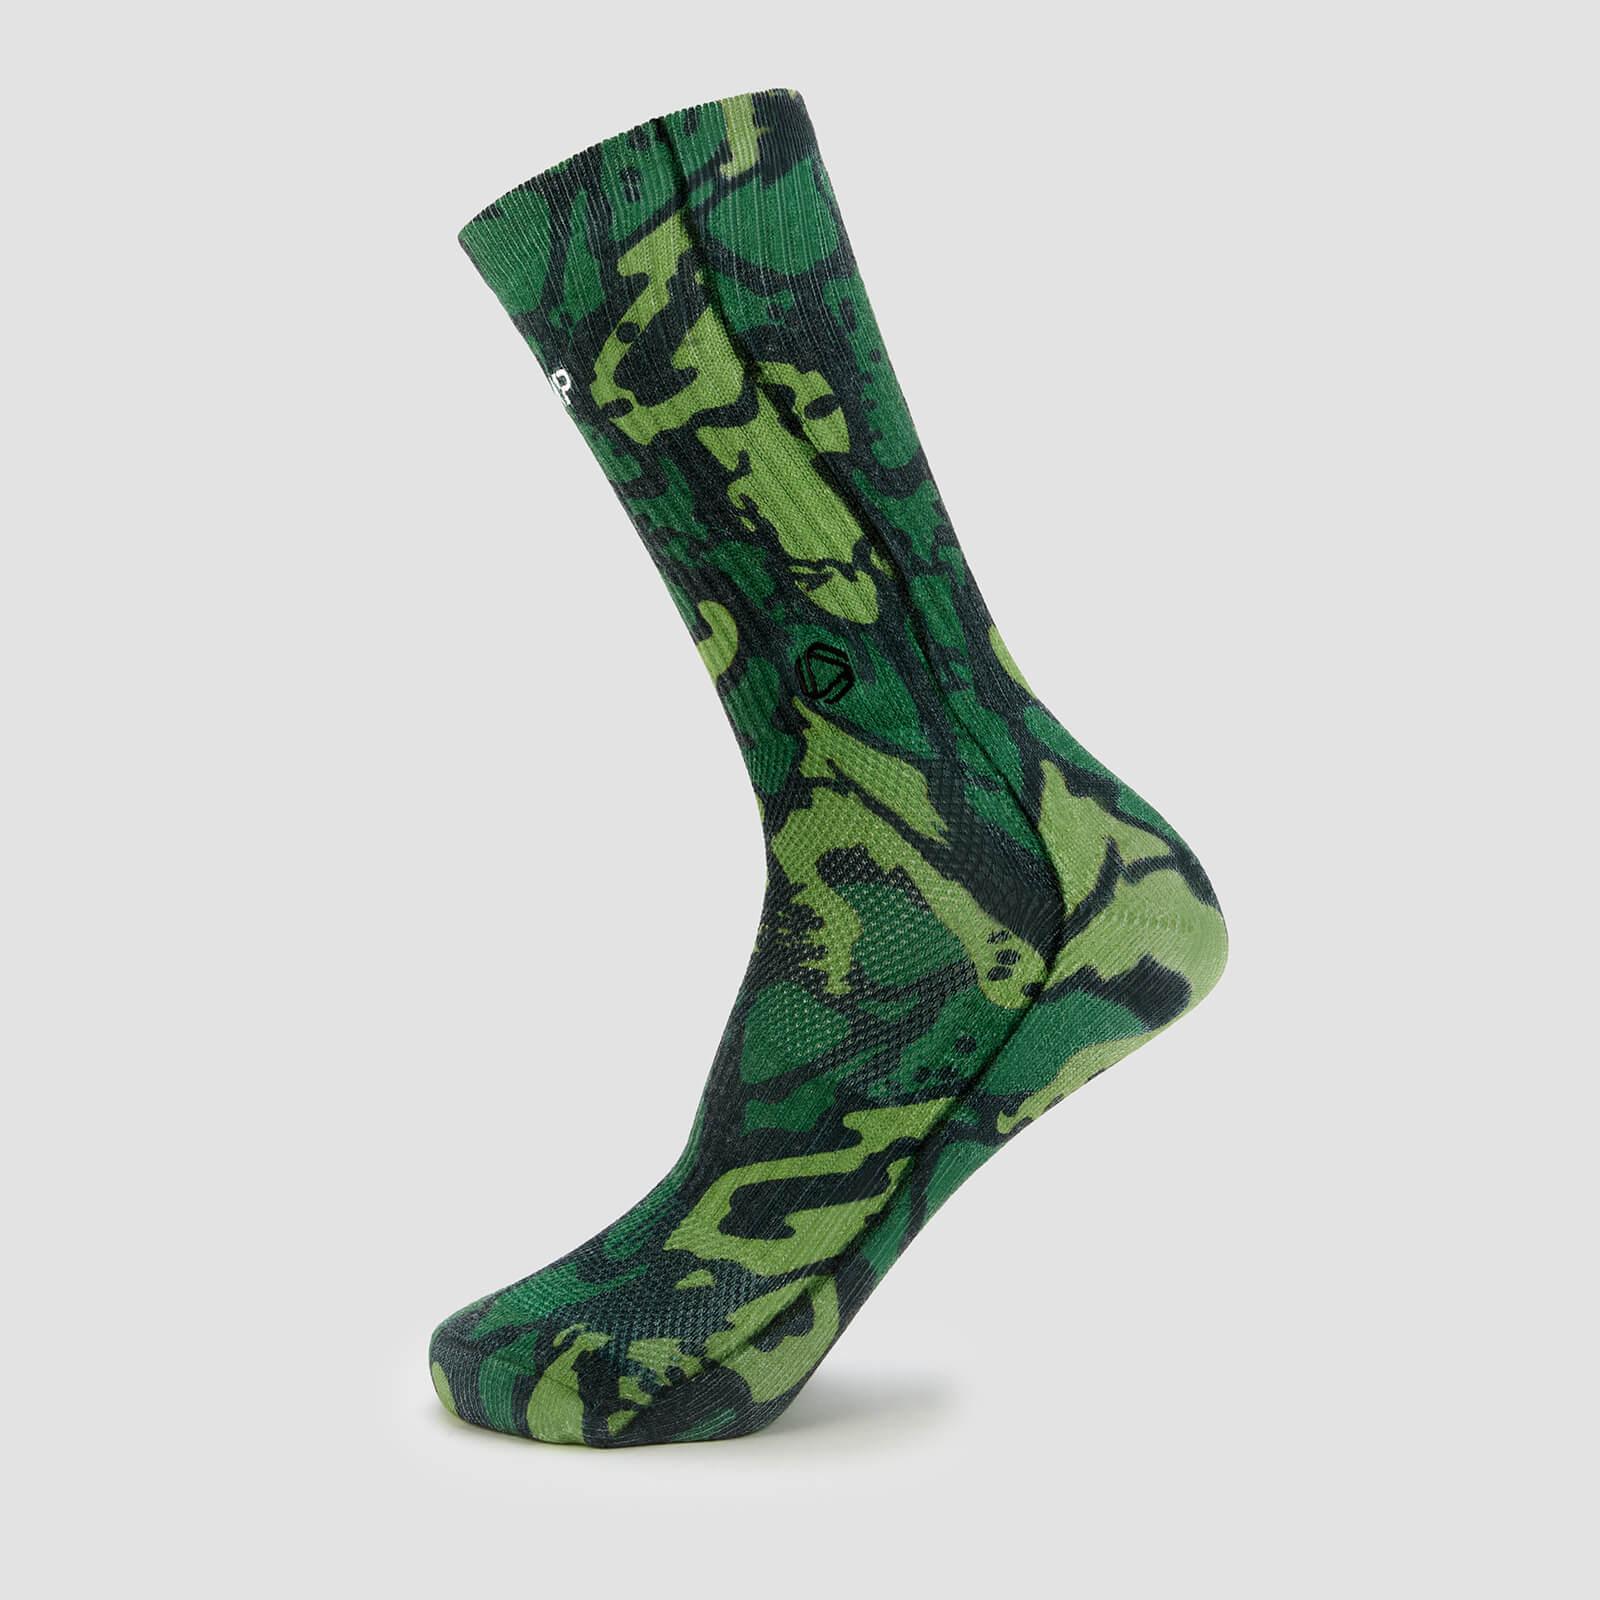 Mp X Hexxee Adapt Crew Socks- Green Camo - Womens Uk 4-7